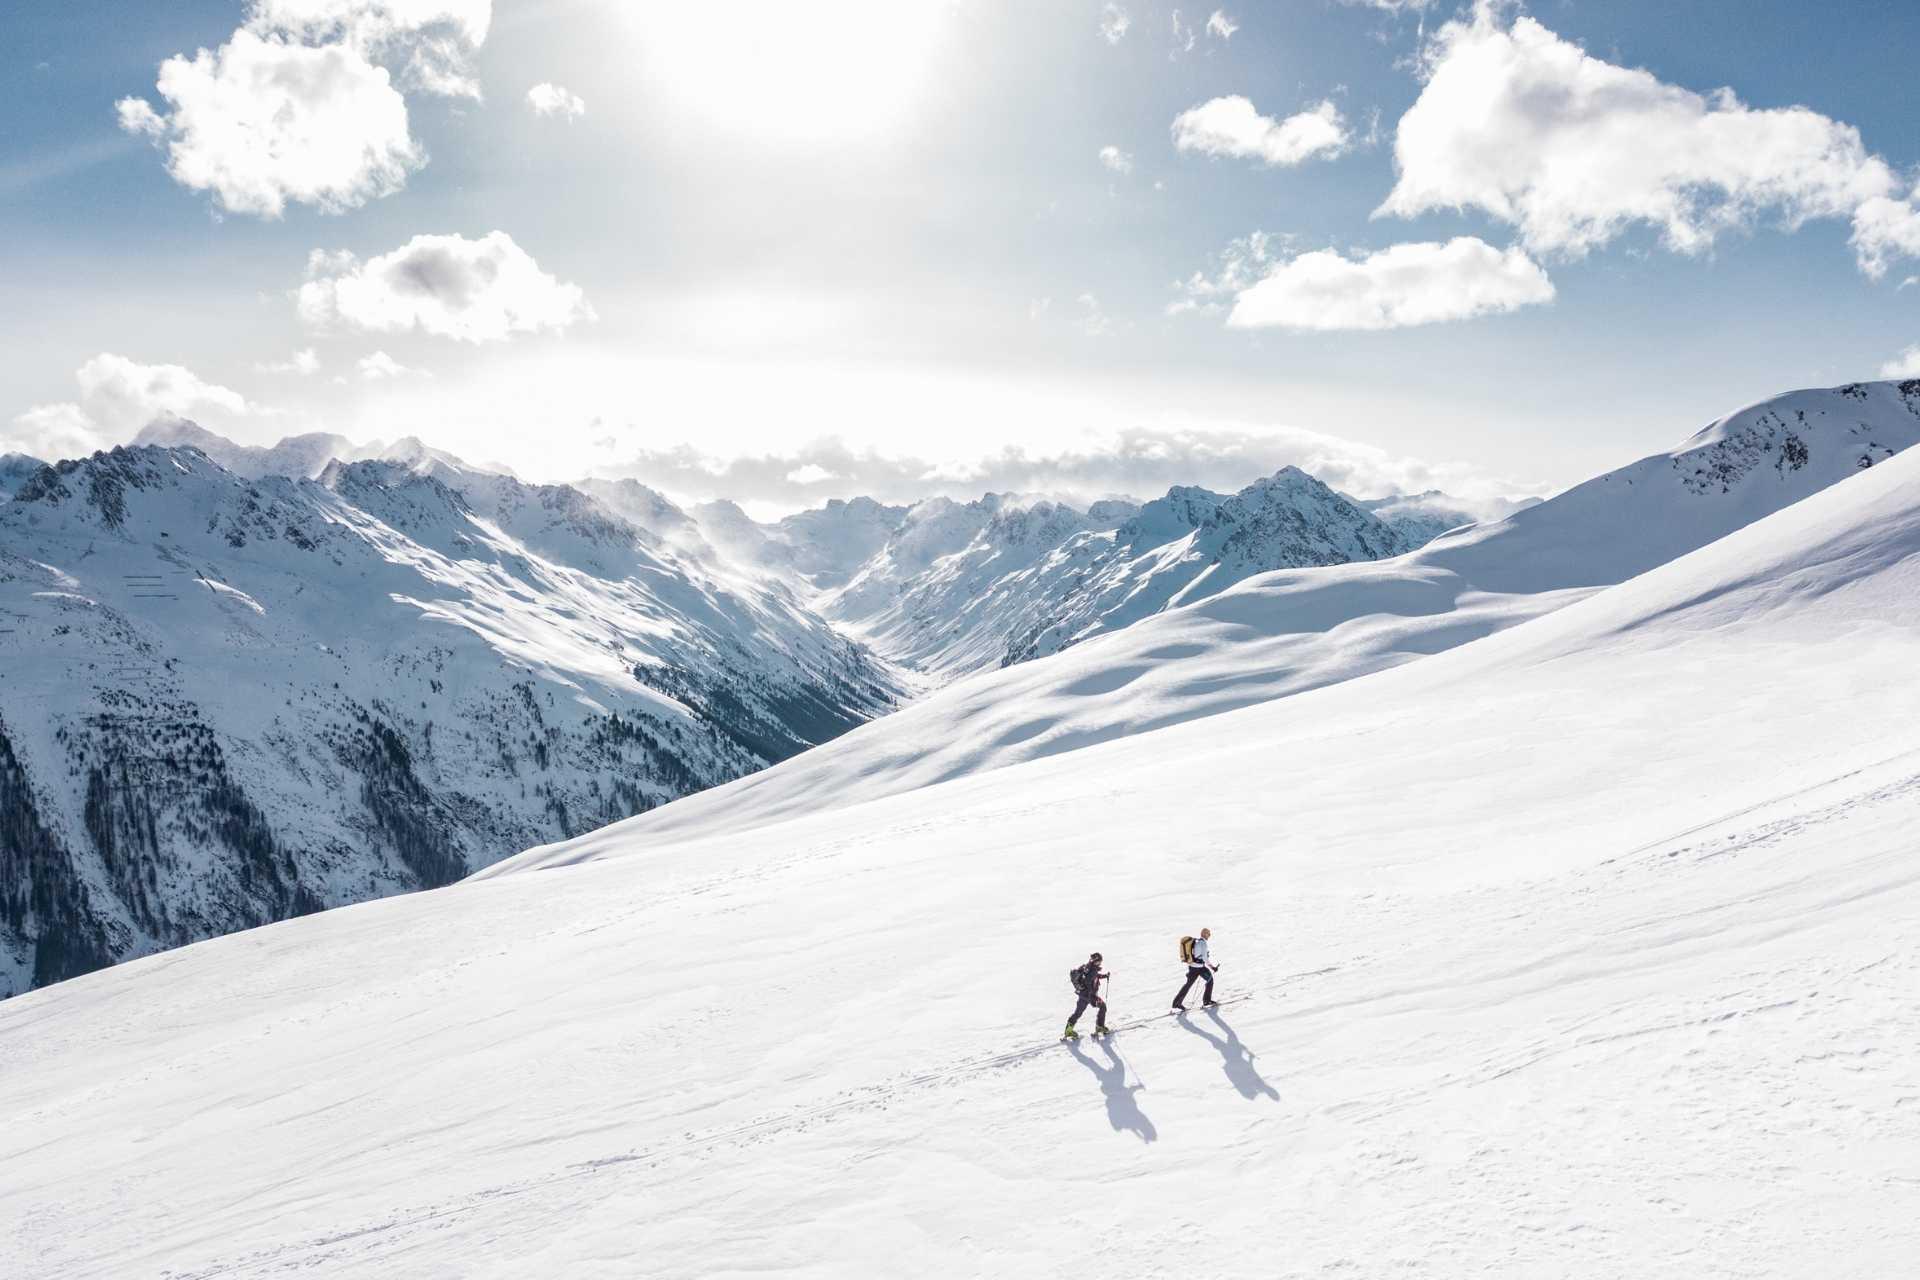 skitour-zwei-tourengeher